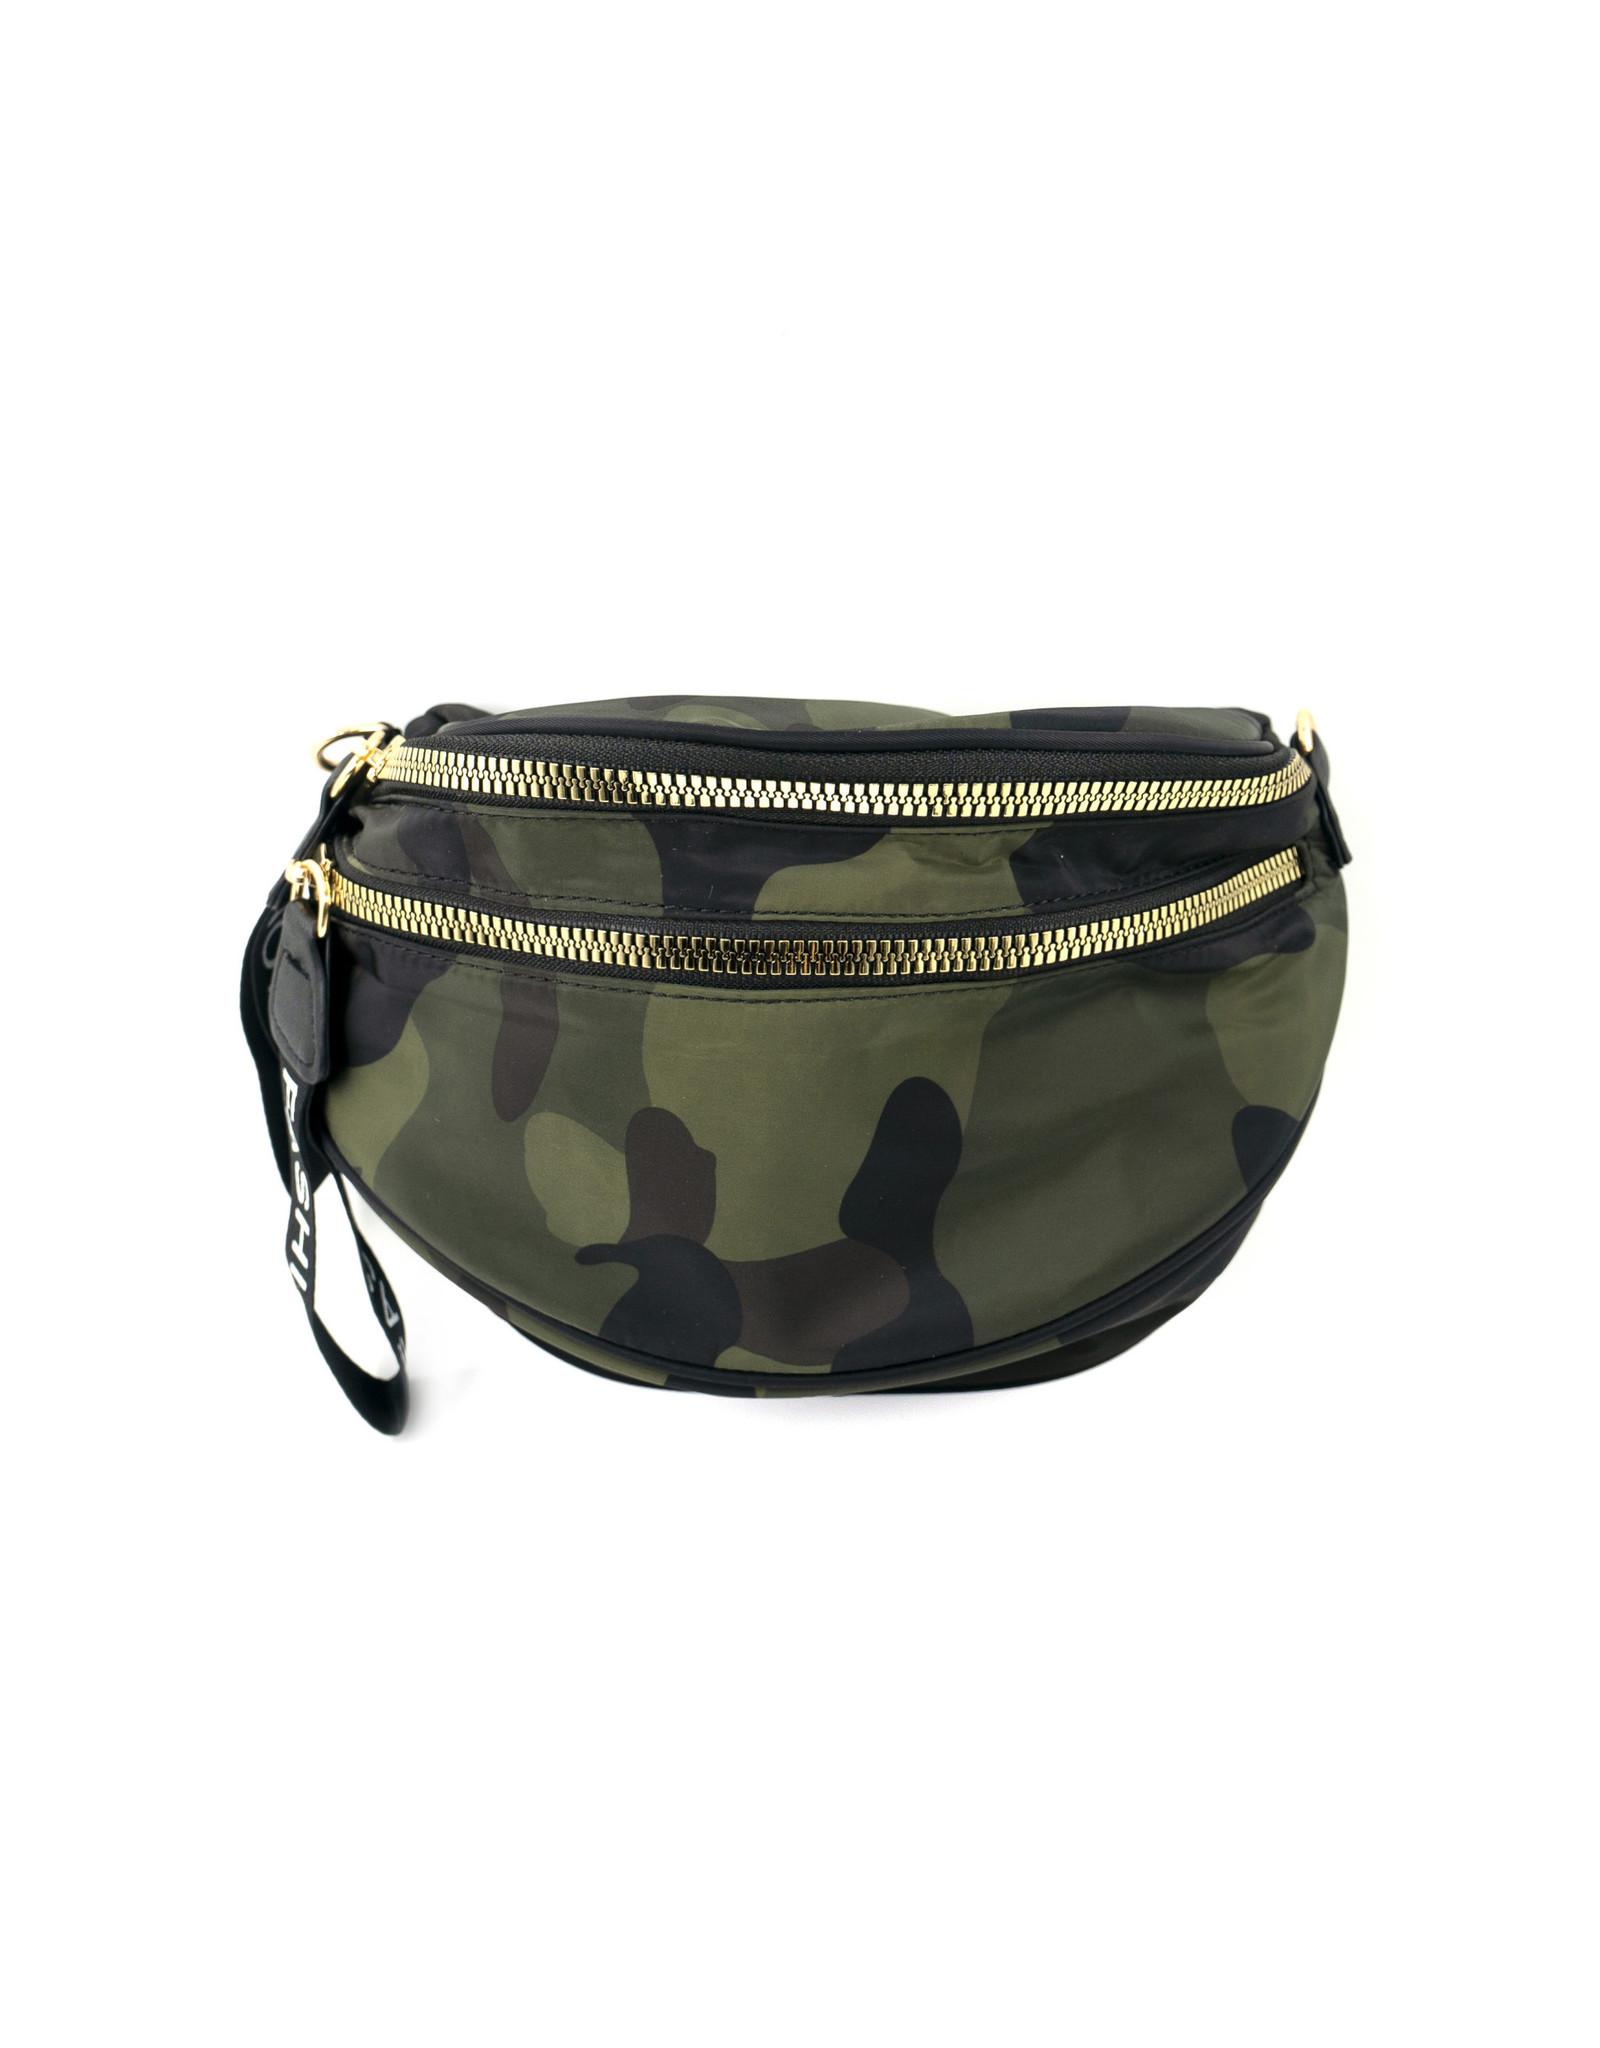 Camo Fanny Pack/Cross-body Bag